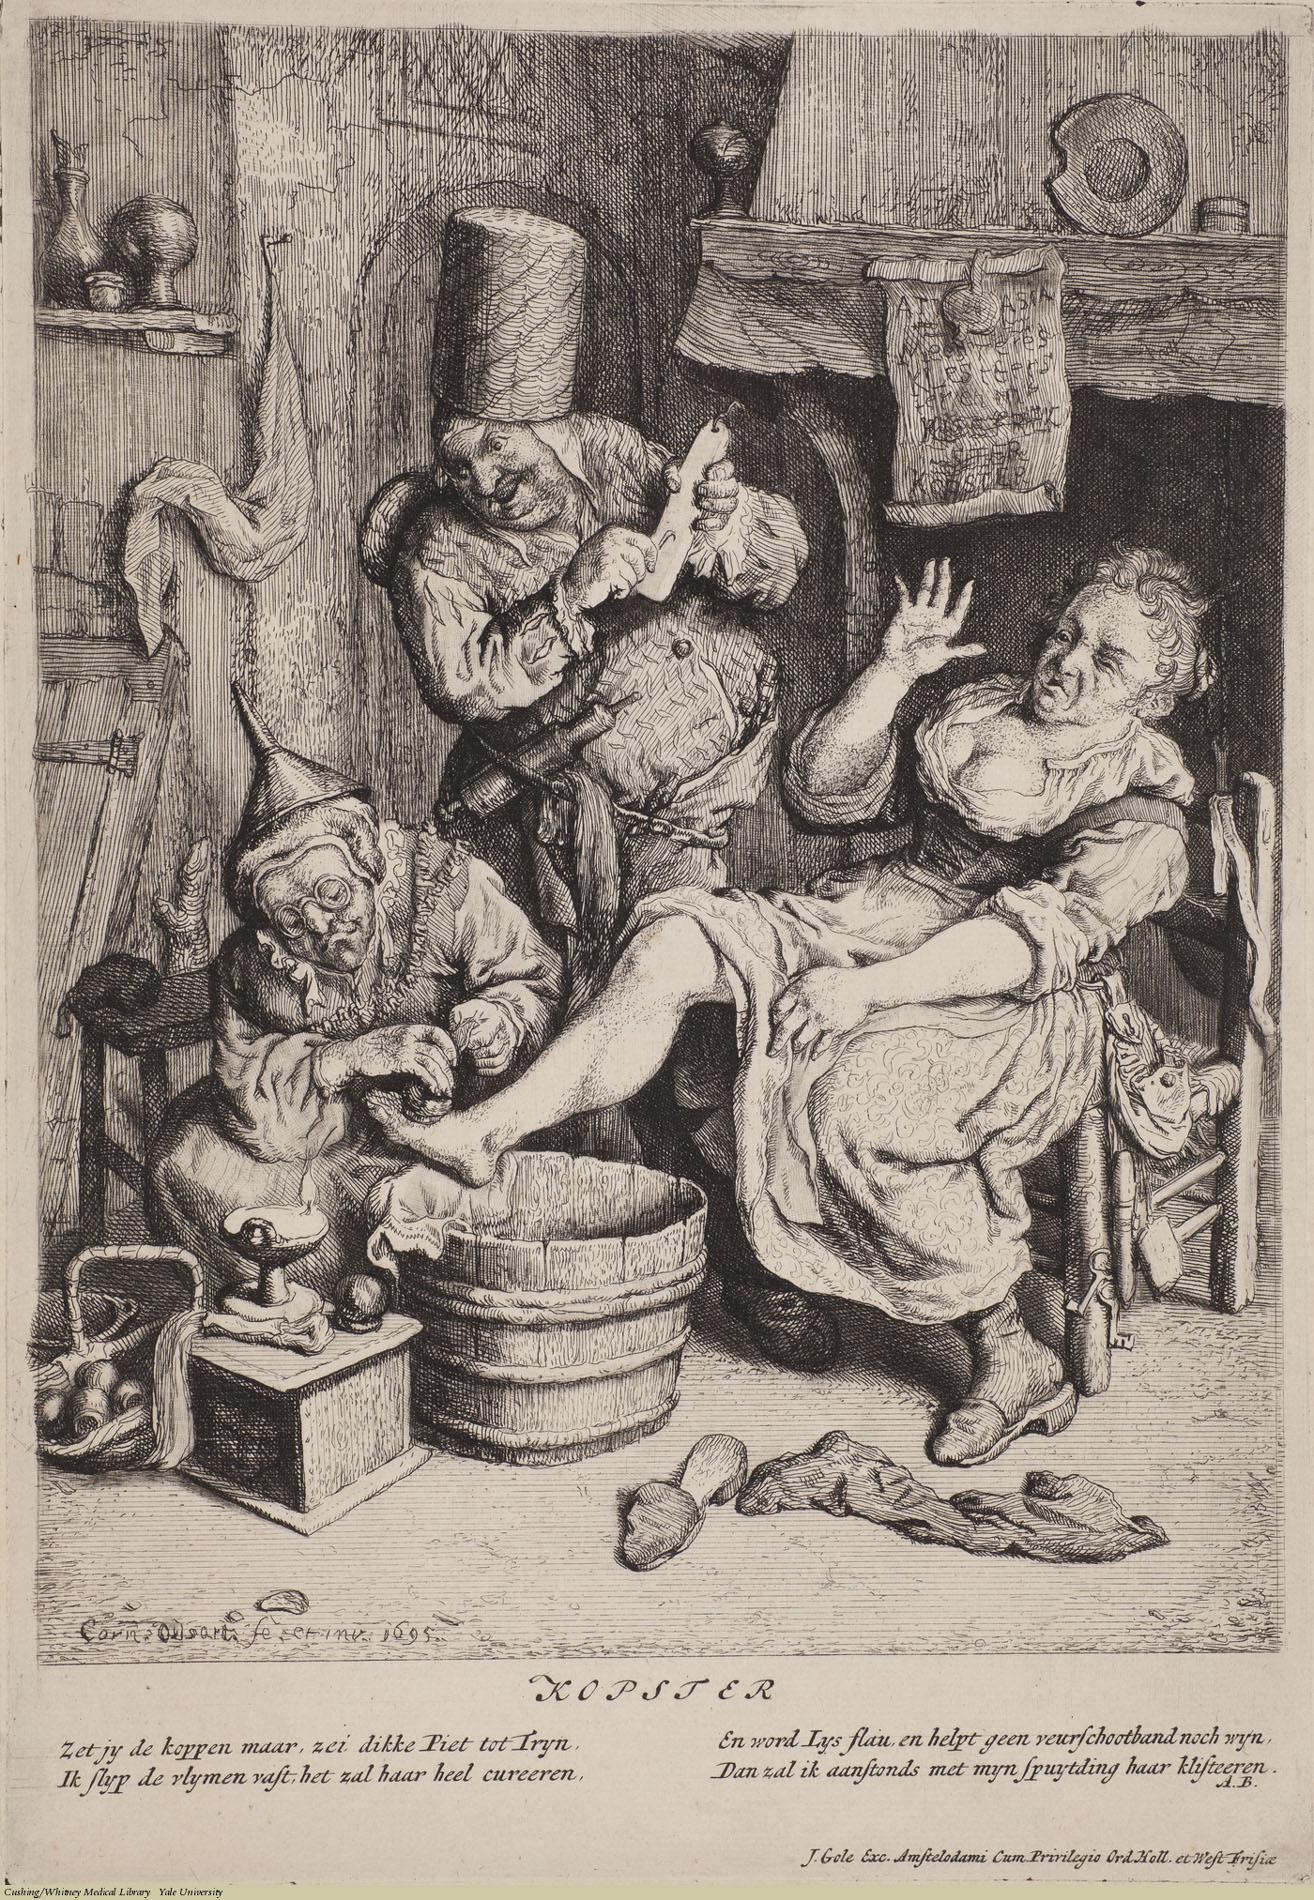 Kopster. Cornelius Dusart, Laid, 1695. Subject: Village Doctors, Phlebotomy, Bleeding Cups, Rural Medicine.